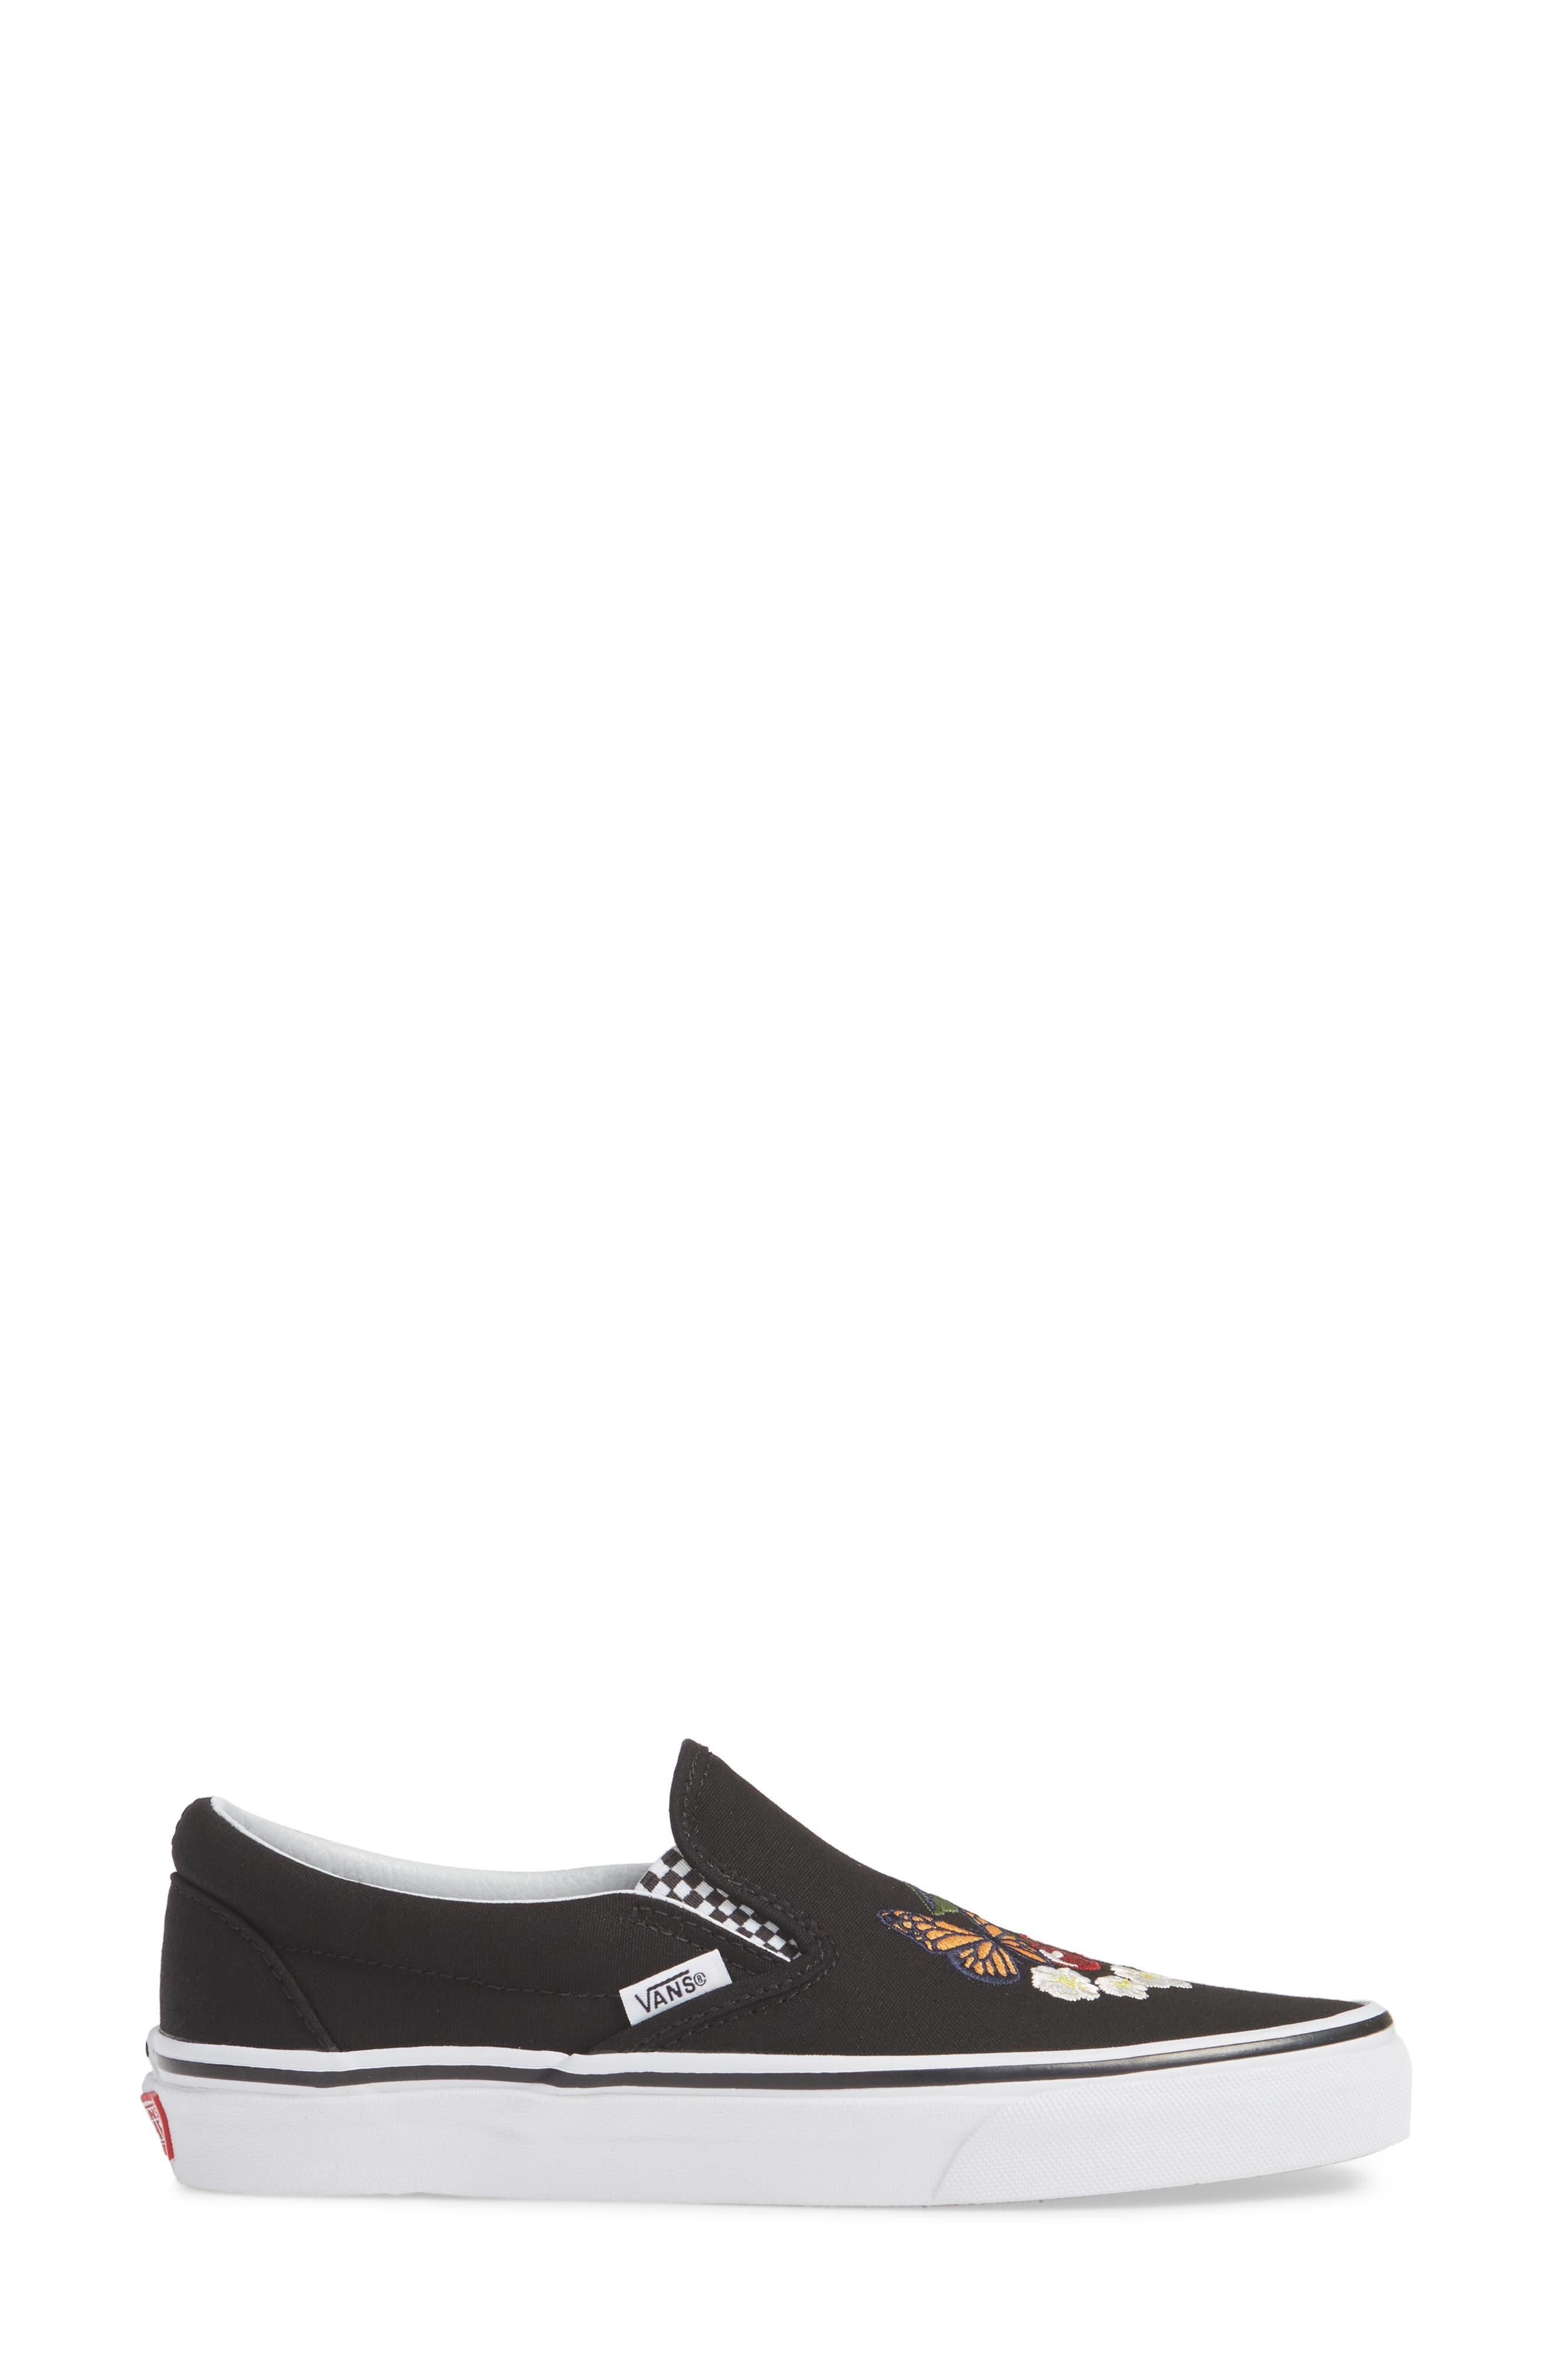 Classic Slip-On Sneaker,                             Alternate thumbnail 3, color,                             CHECKER FLORAL BLACK